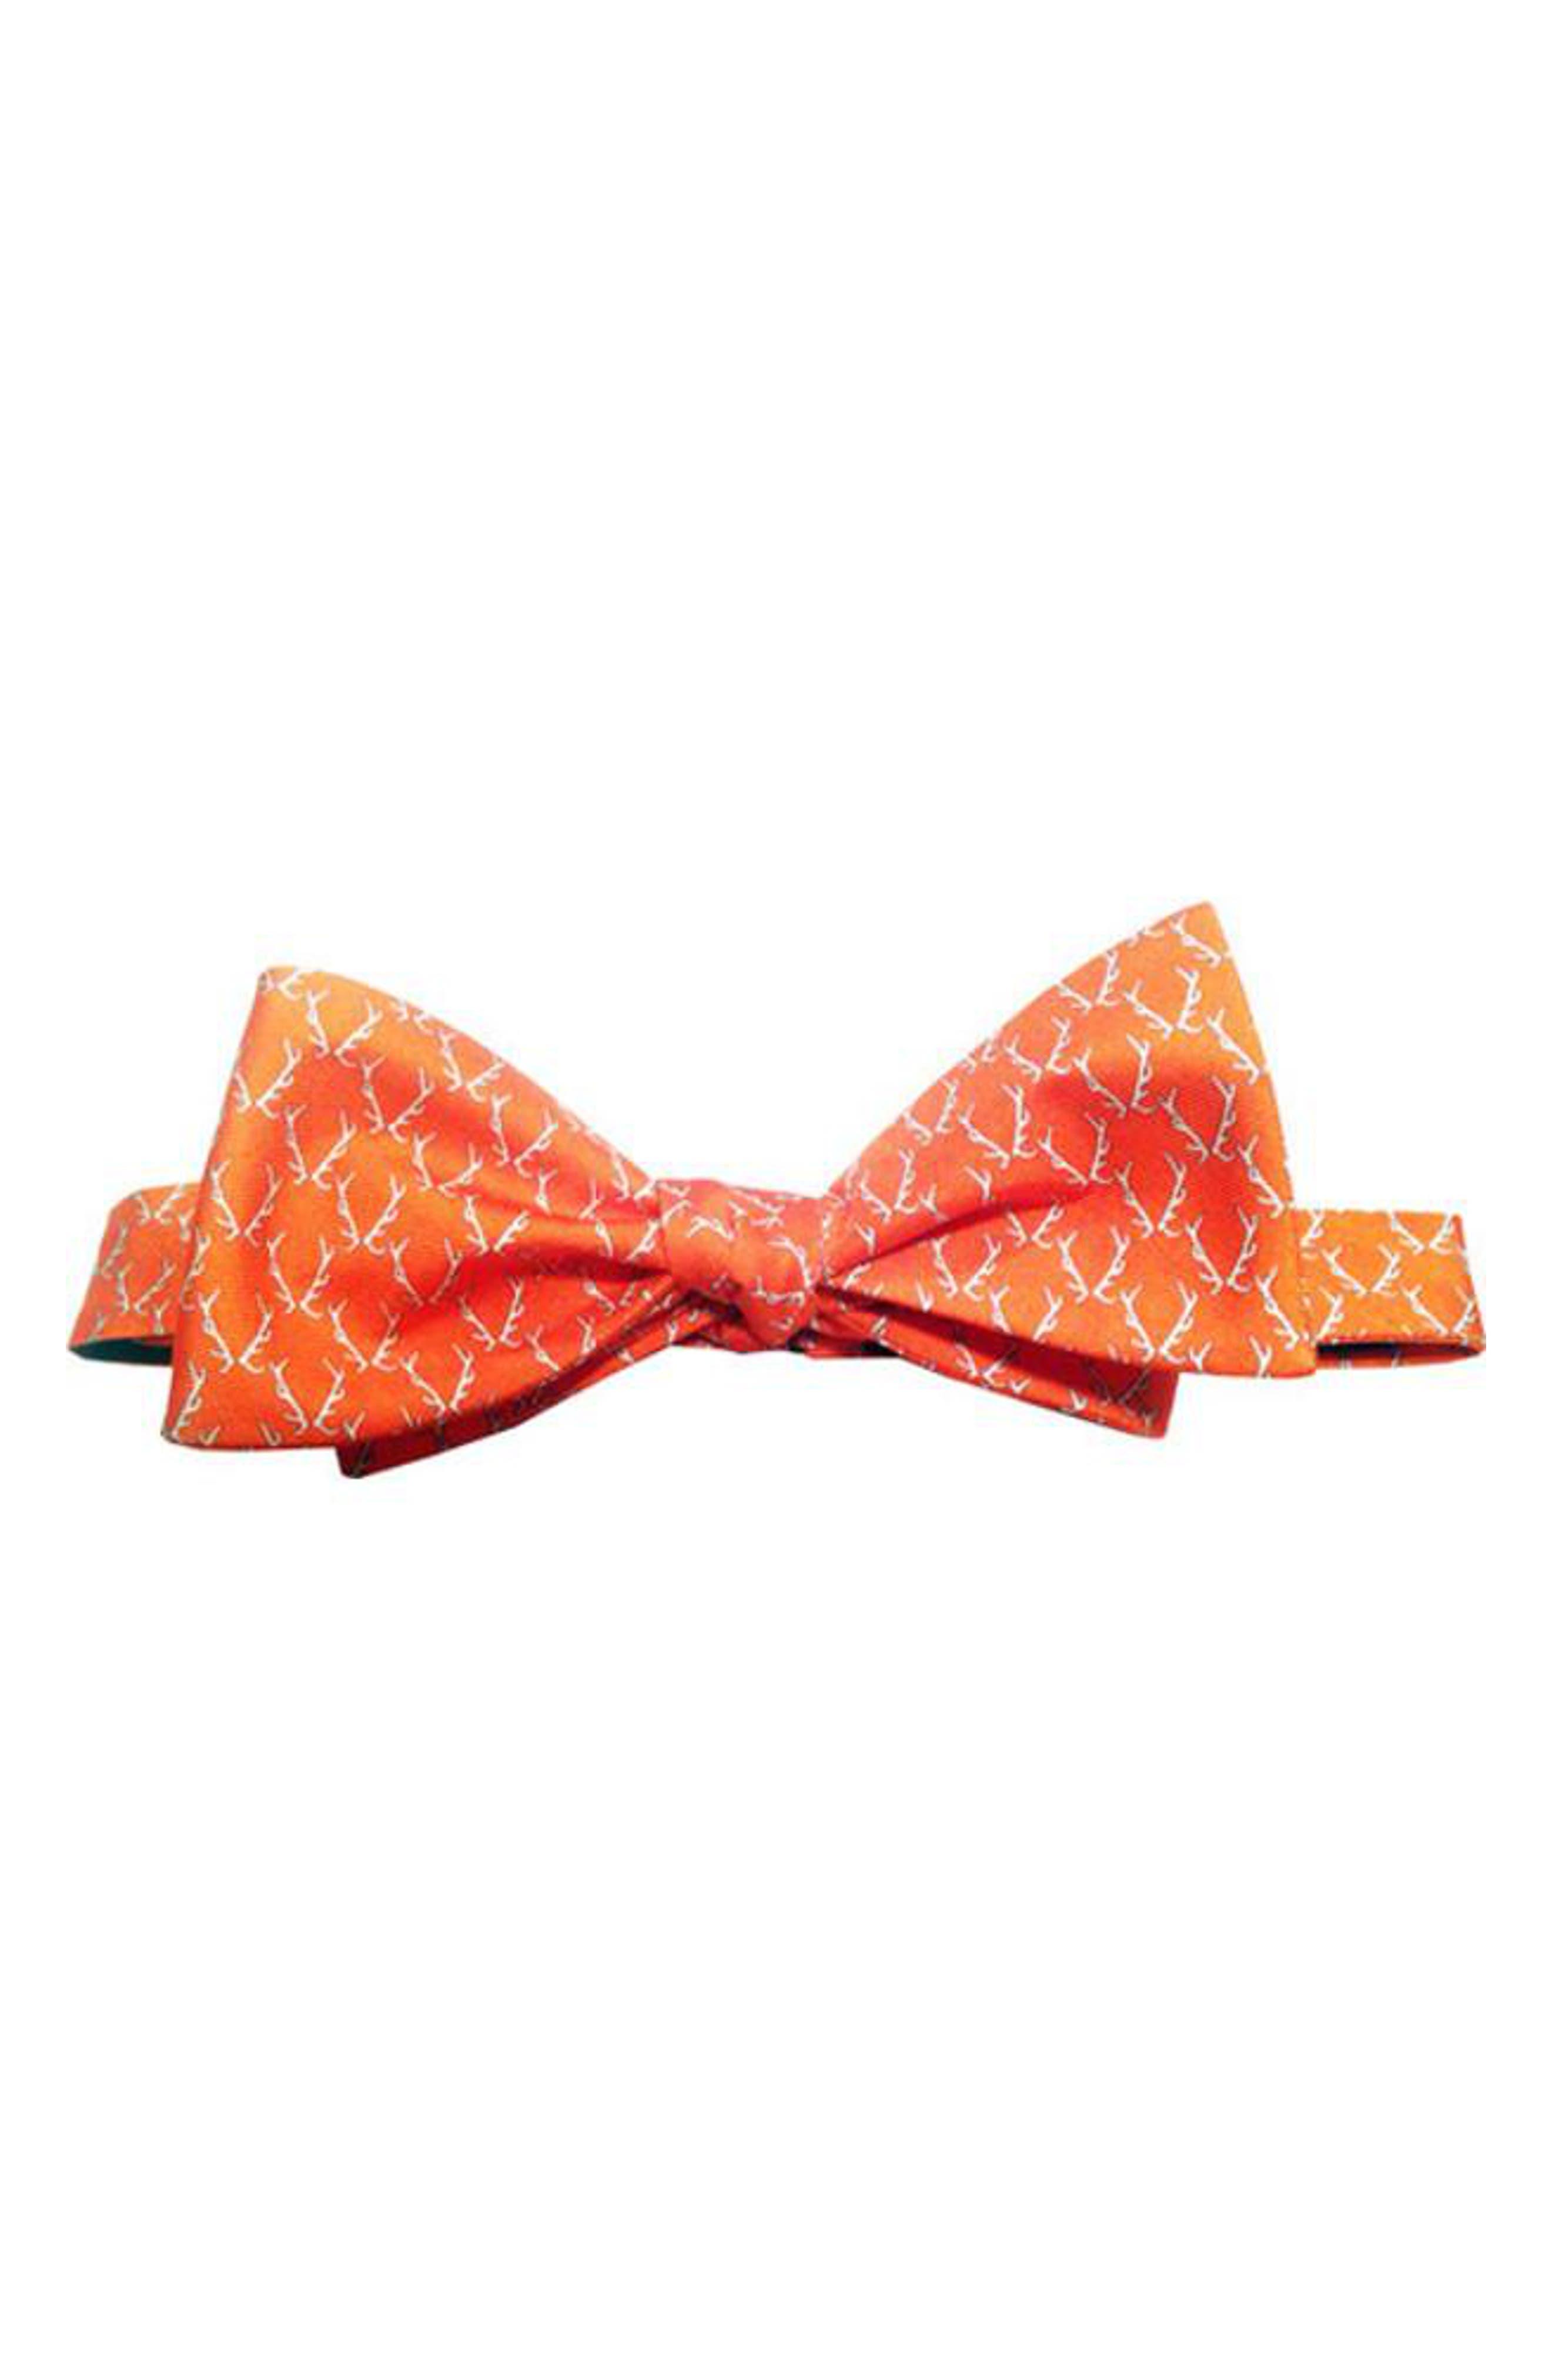 Buckwild Silk Bow Tie,                             Main thumbnail 1, color,                             800